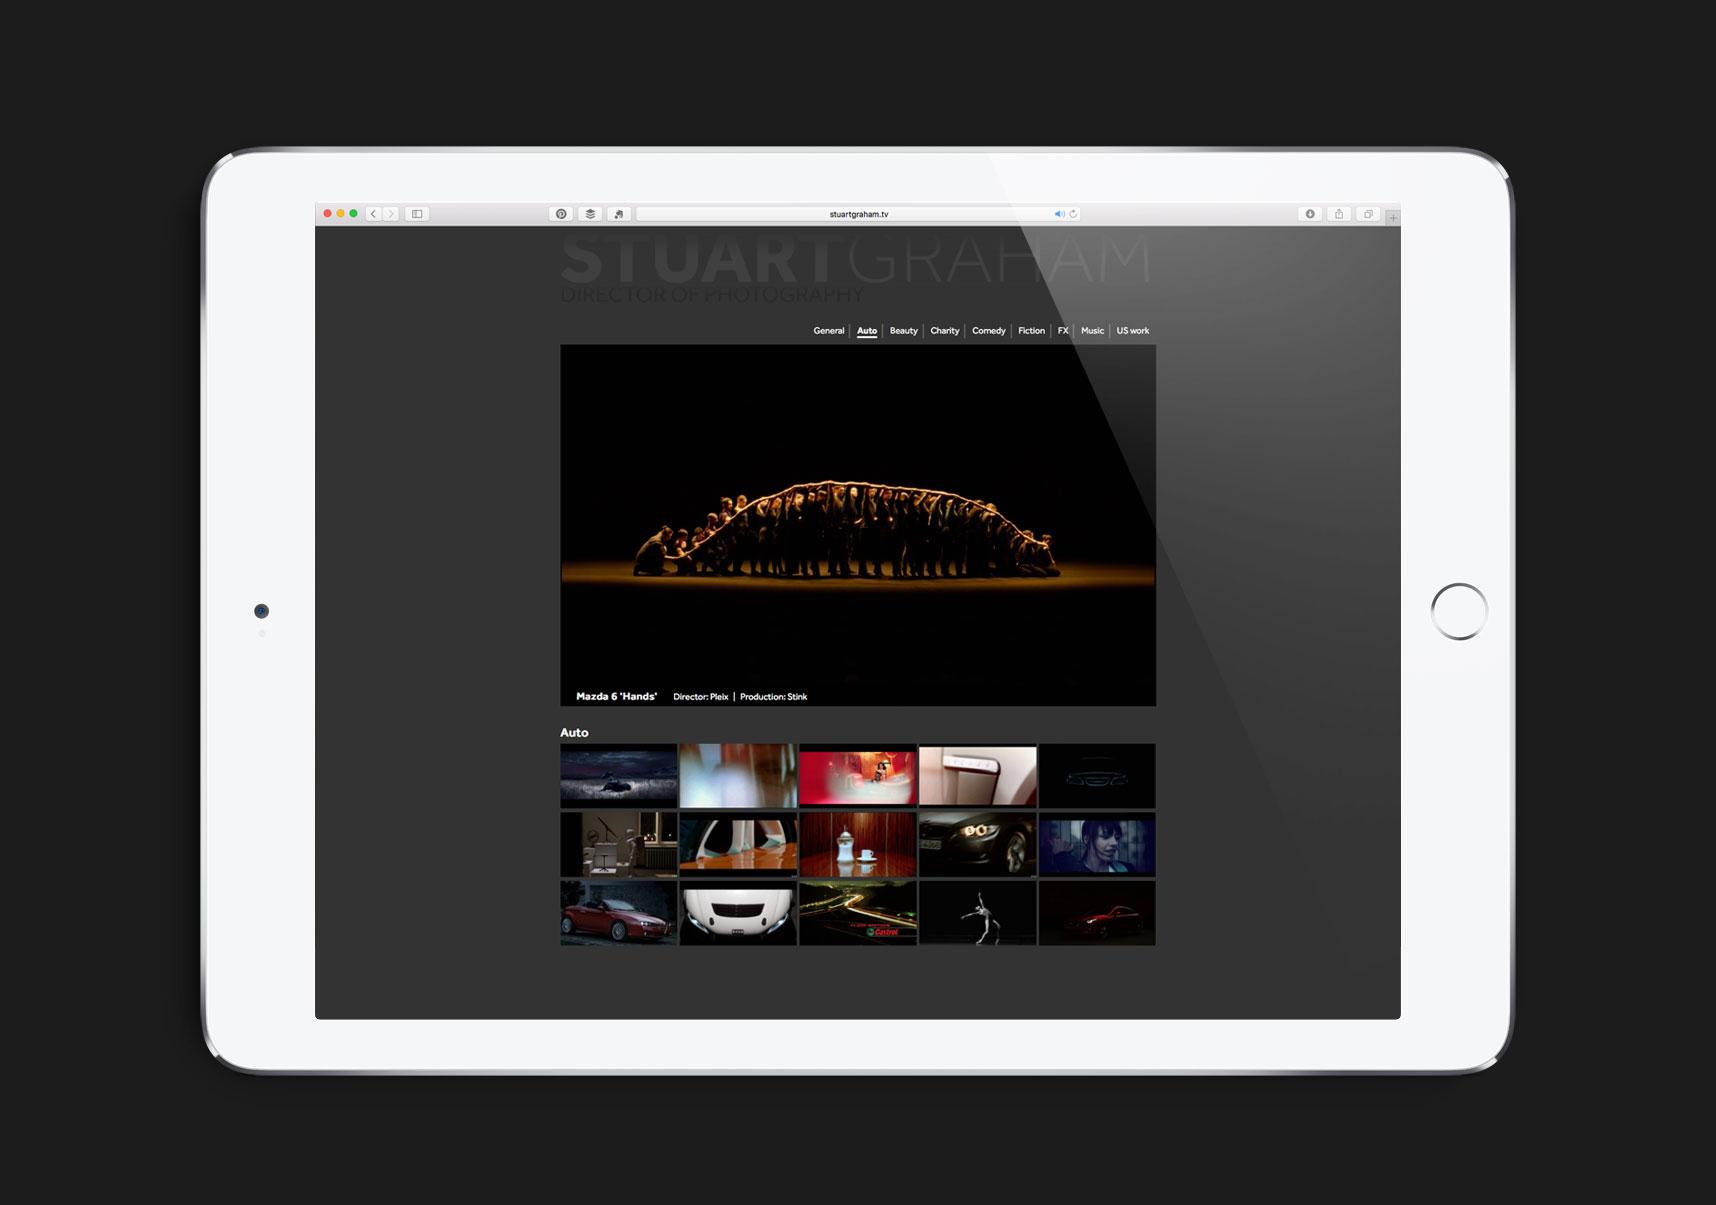 StuartGraham_iPad_01.jpg